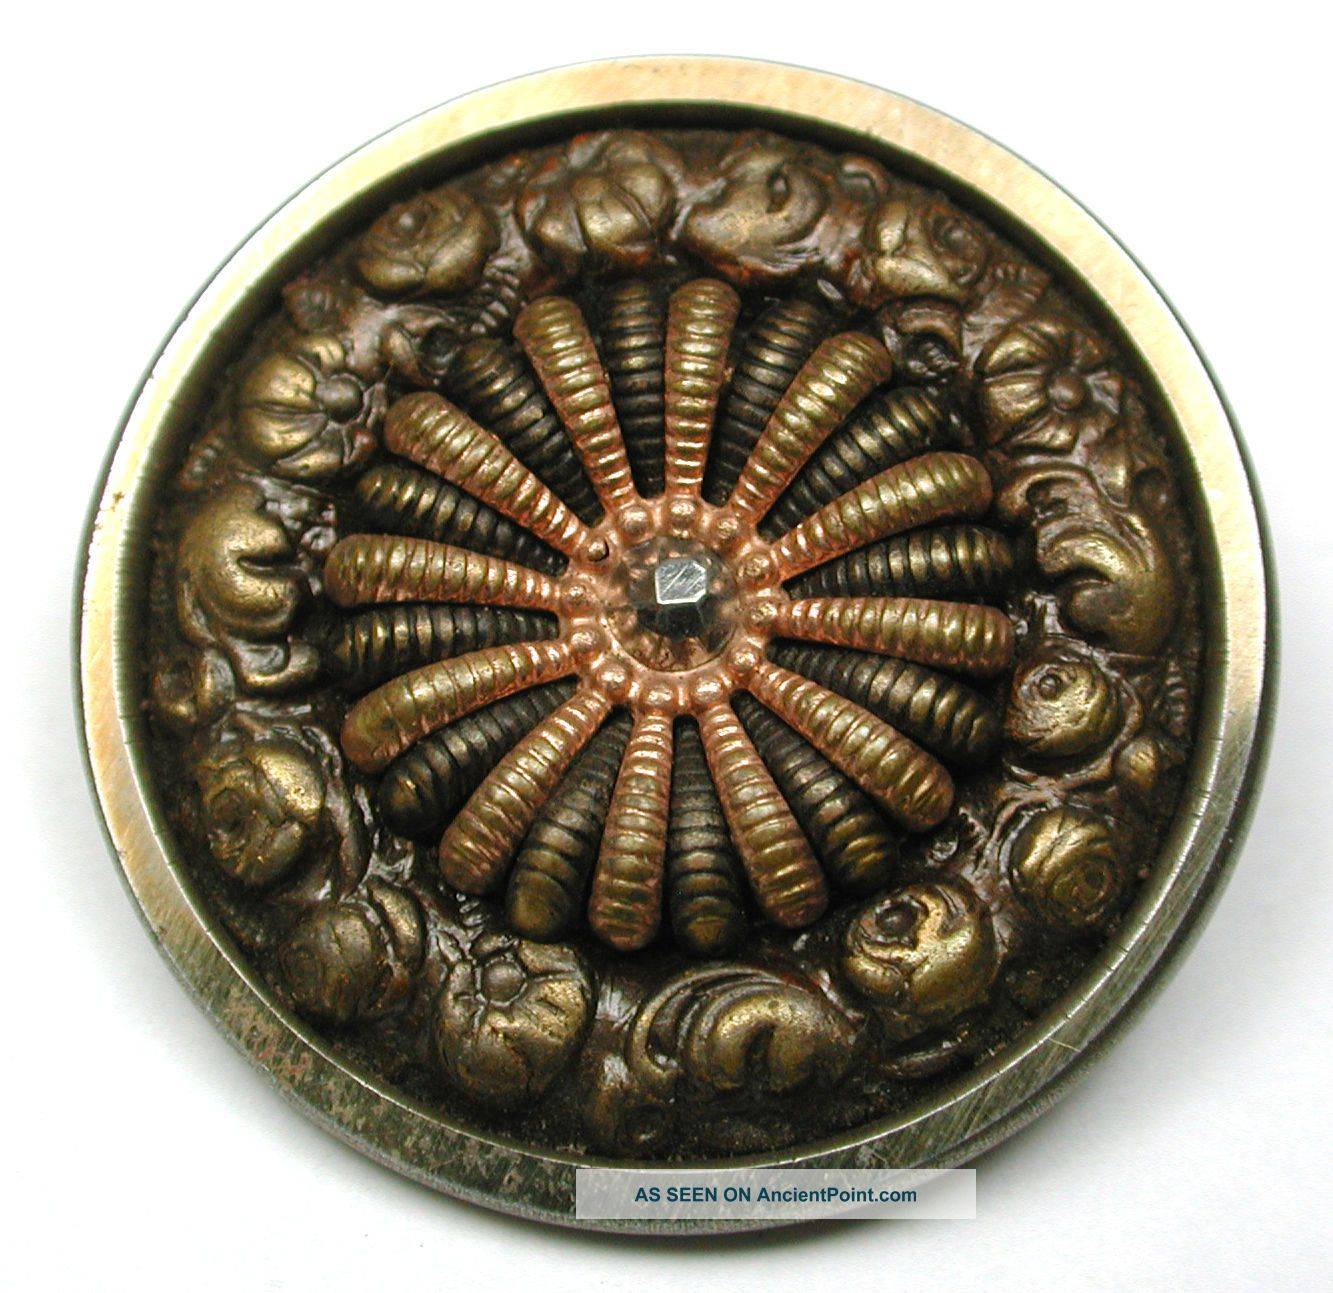 Lg Sz Antique Steel Cup Button Fancy Brass Floral W/ Cut Steel Accent 1 & 1/4